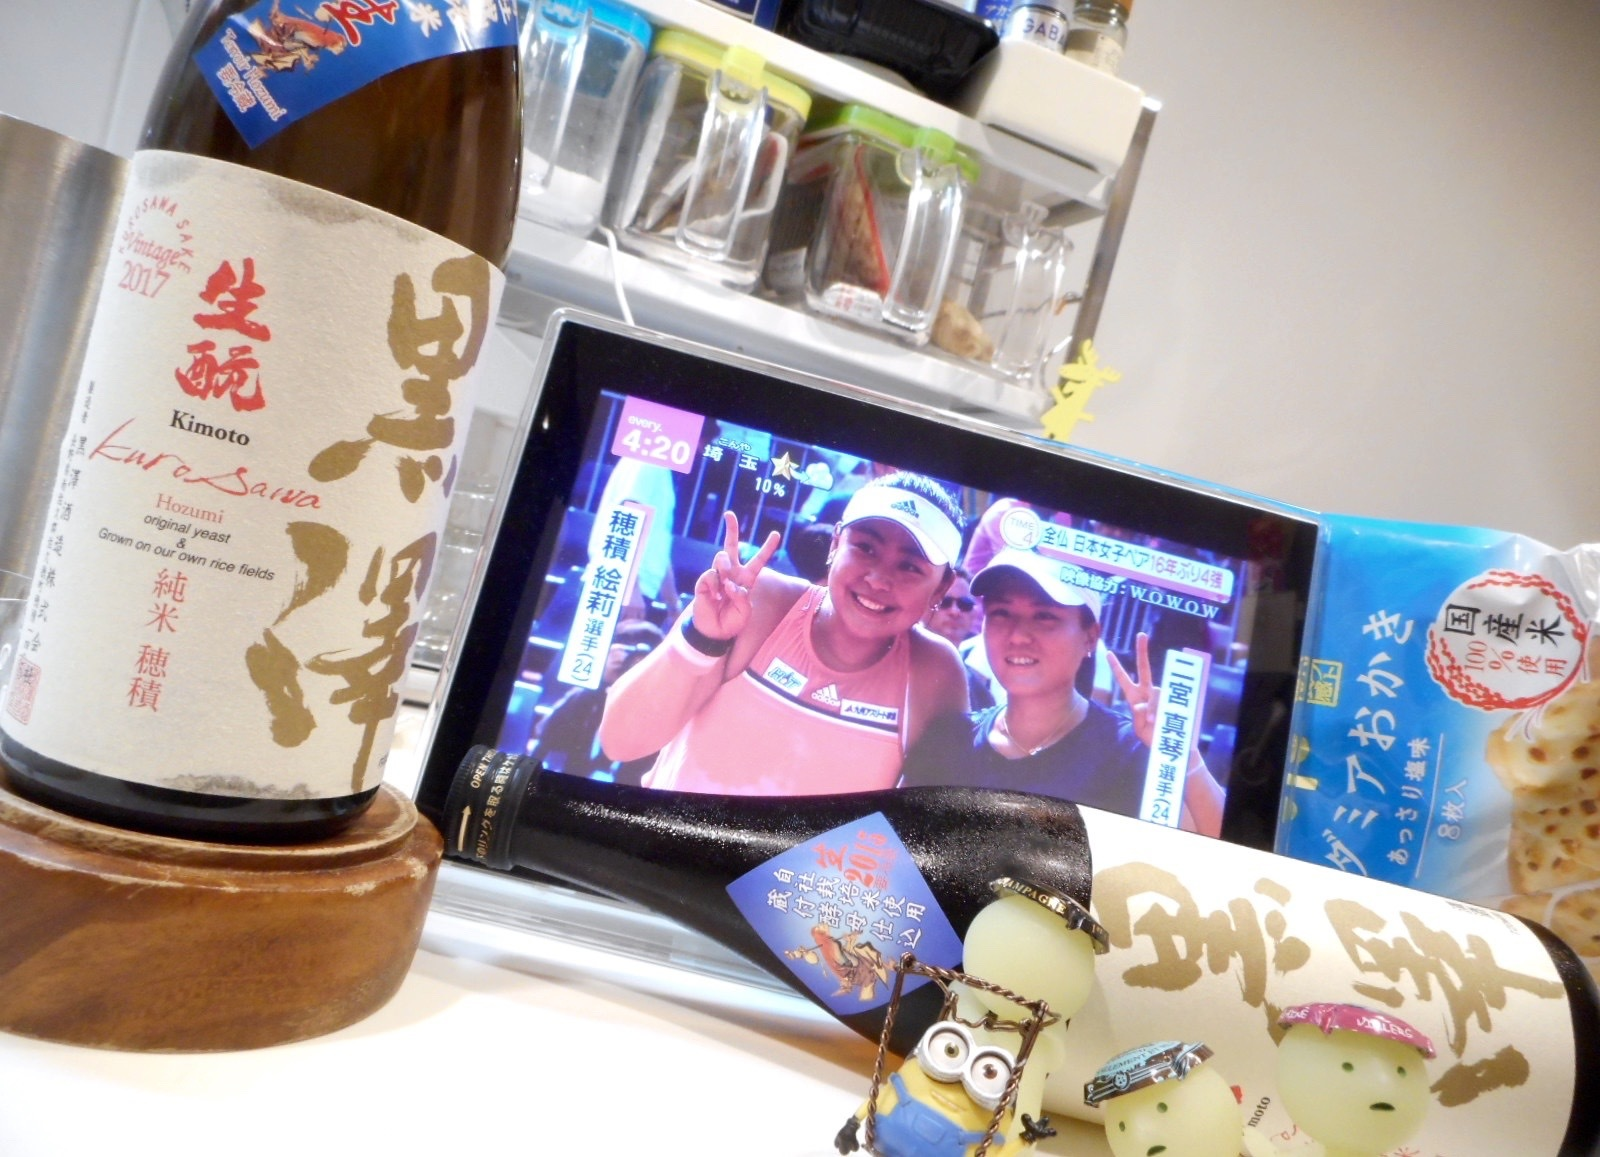 kurosawa_hozumi29by1.jpg